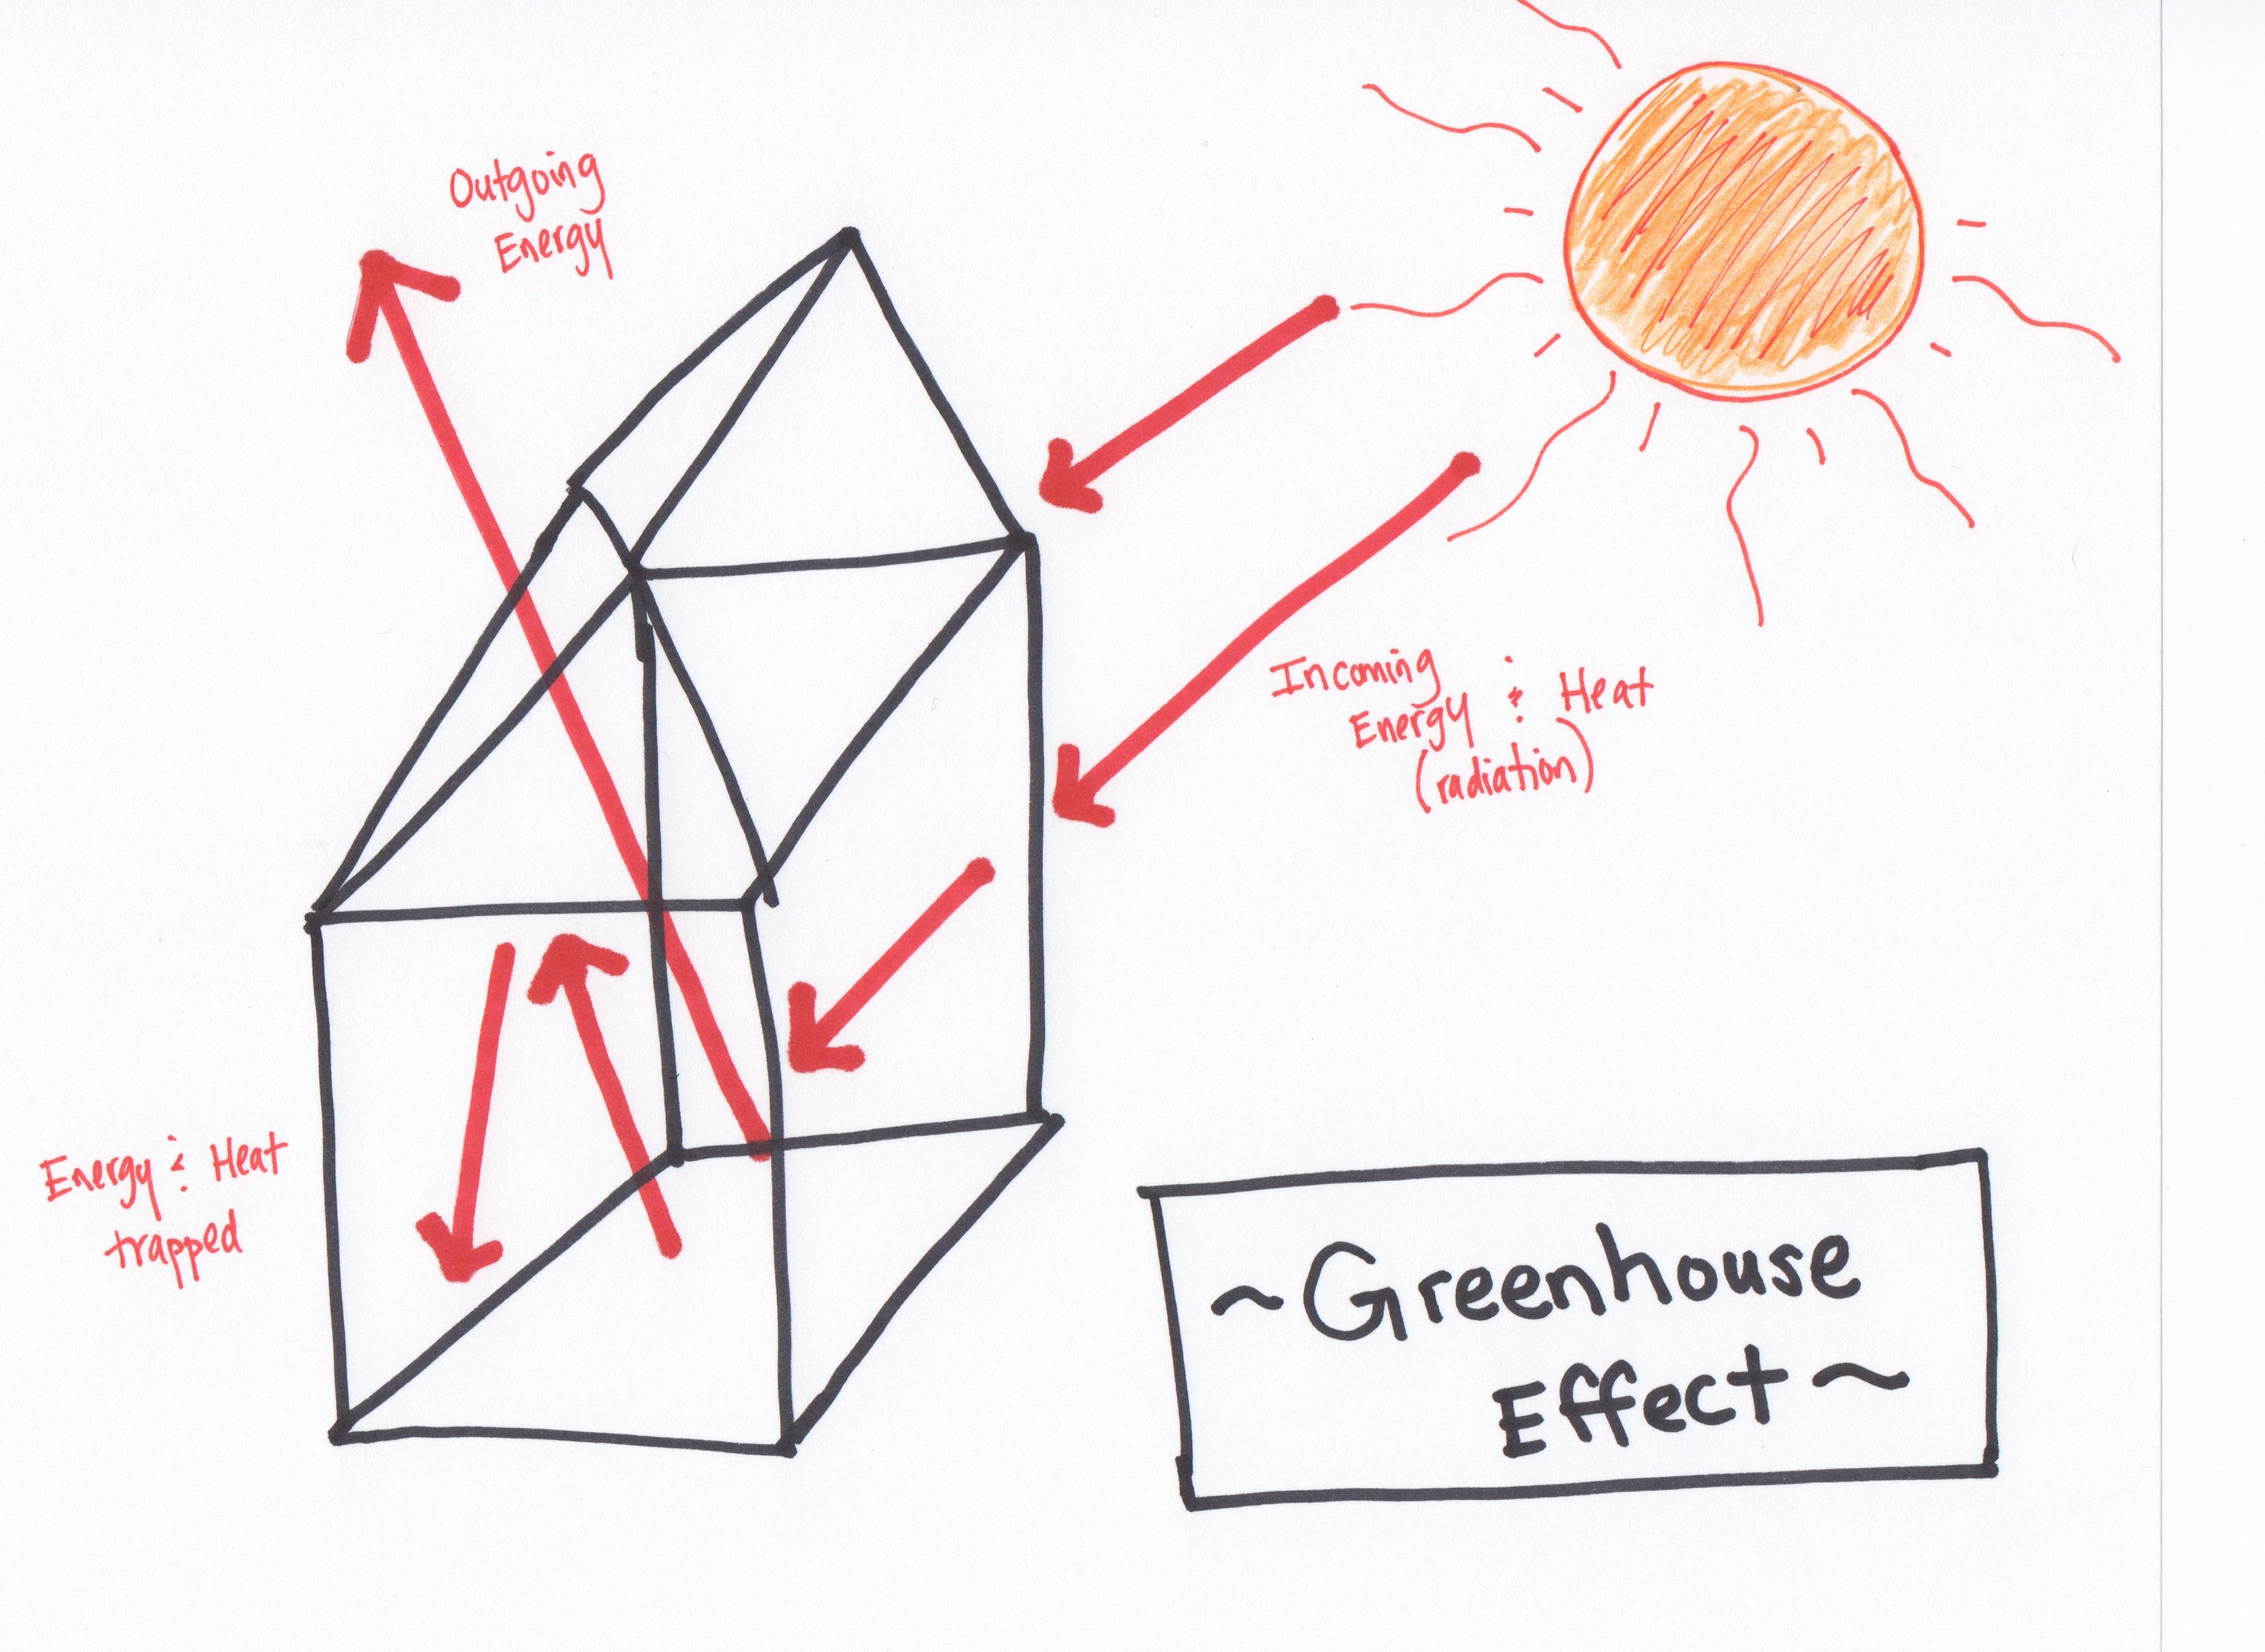 Greenhouse Effect Diagram Worksheet